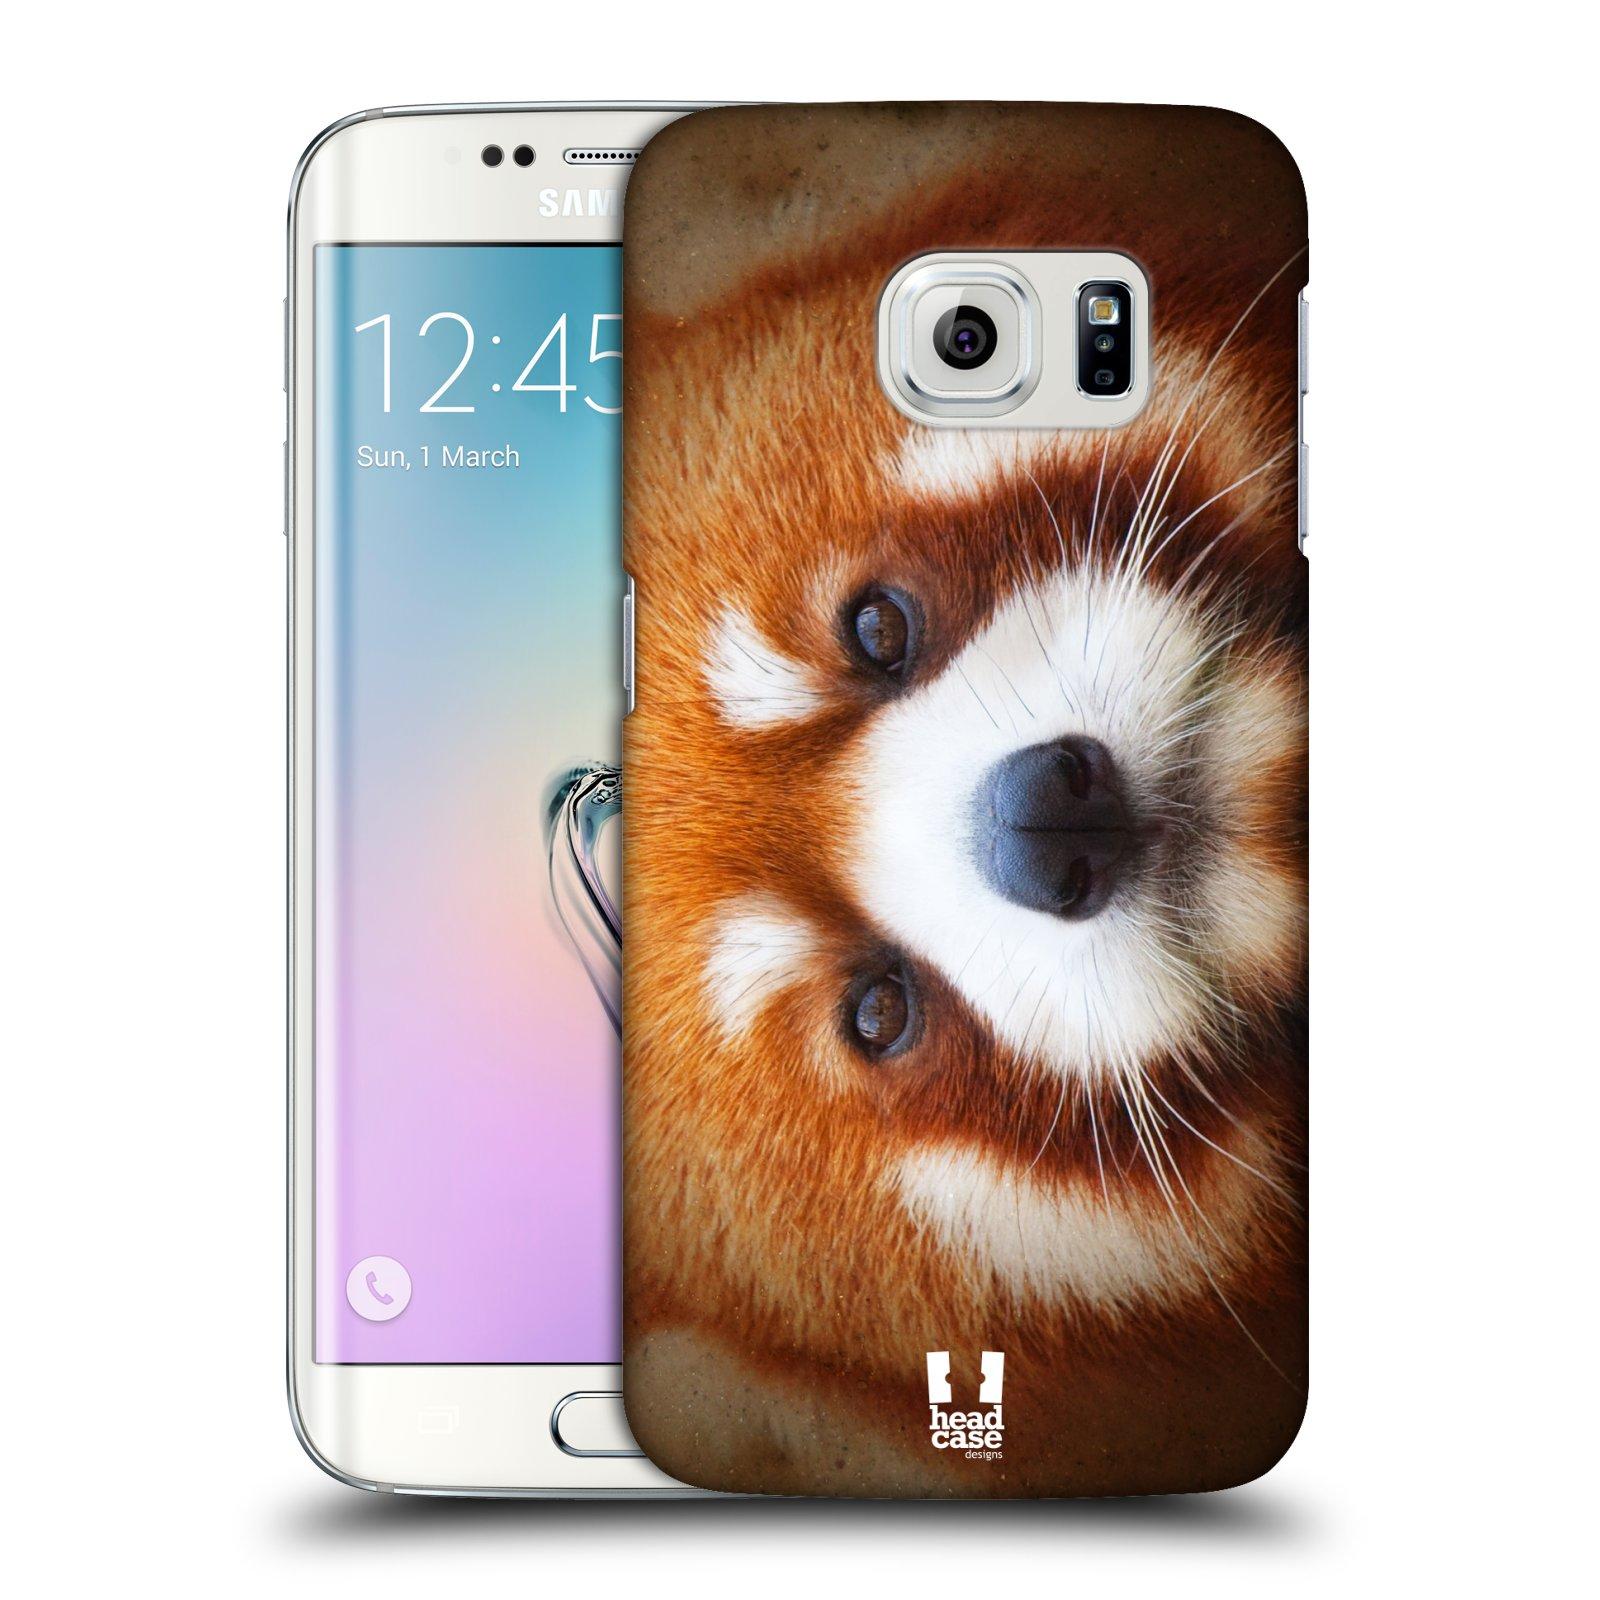 HEAD CASE plastový obal na mobil SAMSUNG Galaxy S6 EDGE (G9250, G925, G925F) vzor Zvířecí tváře 2 medvěd panda rudá